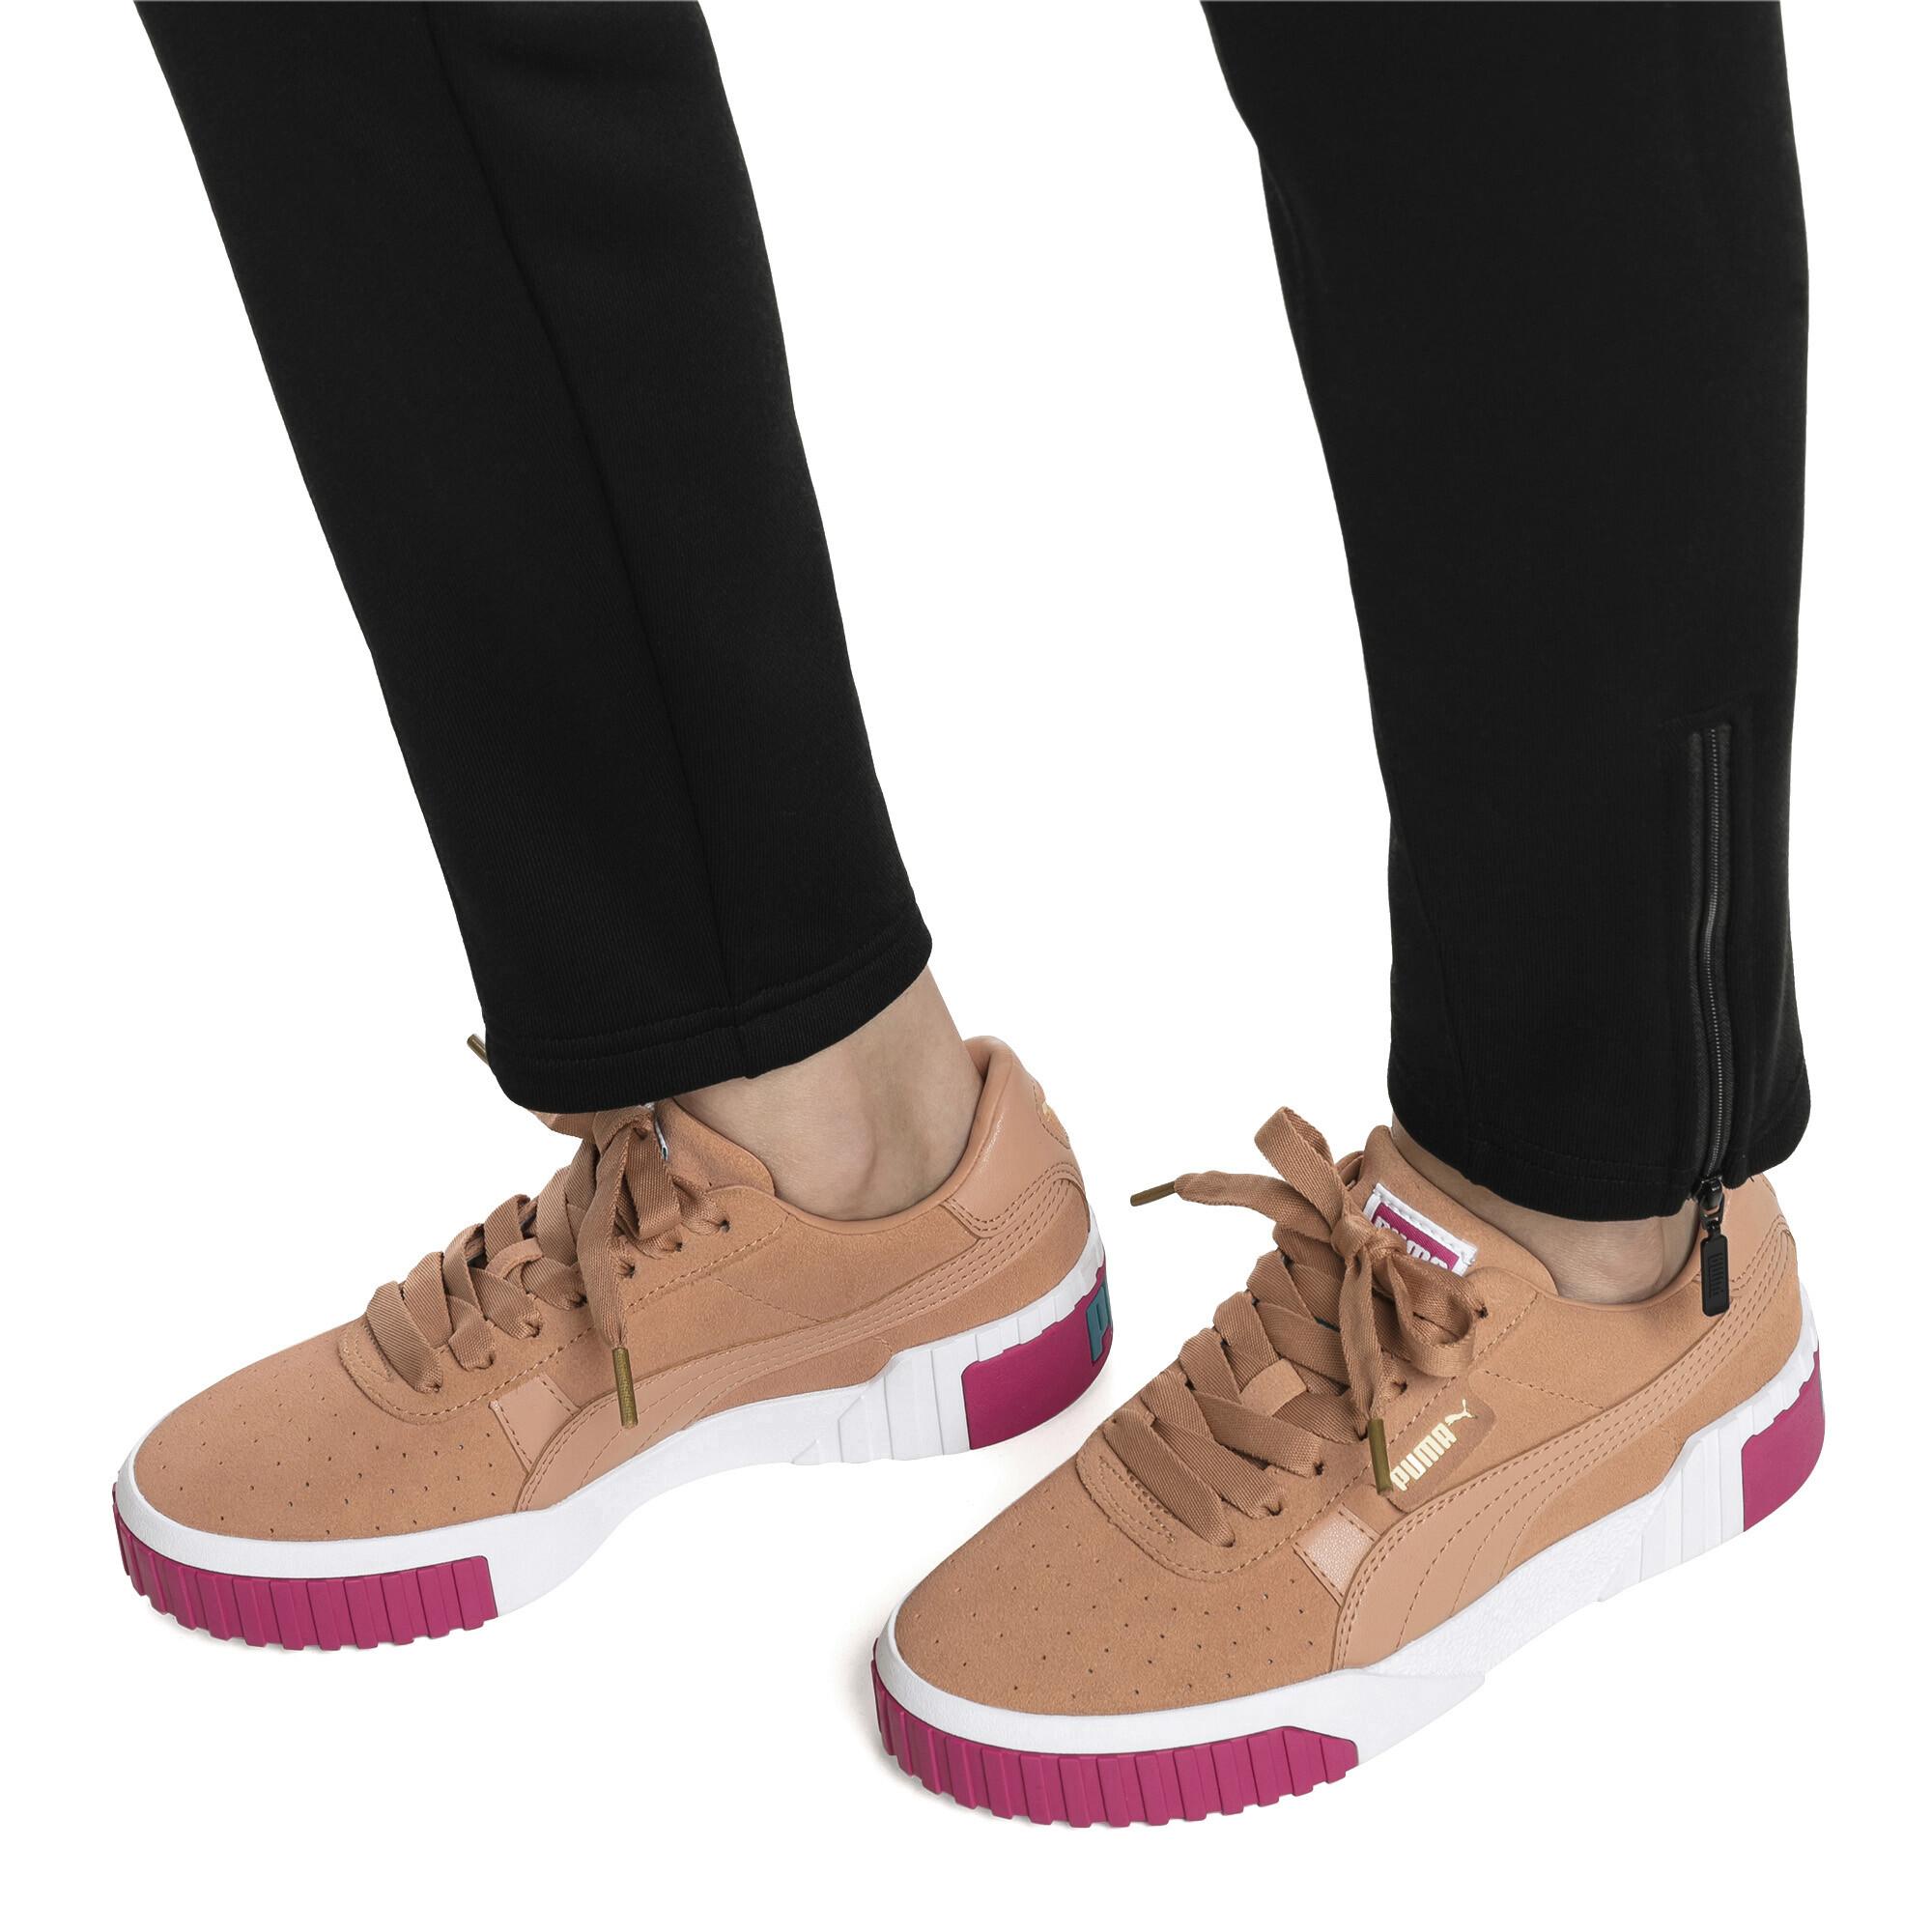 Image Puma Cali Suede Women's Sneakers #2